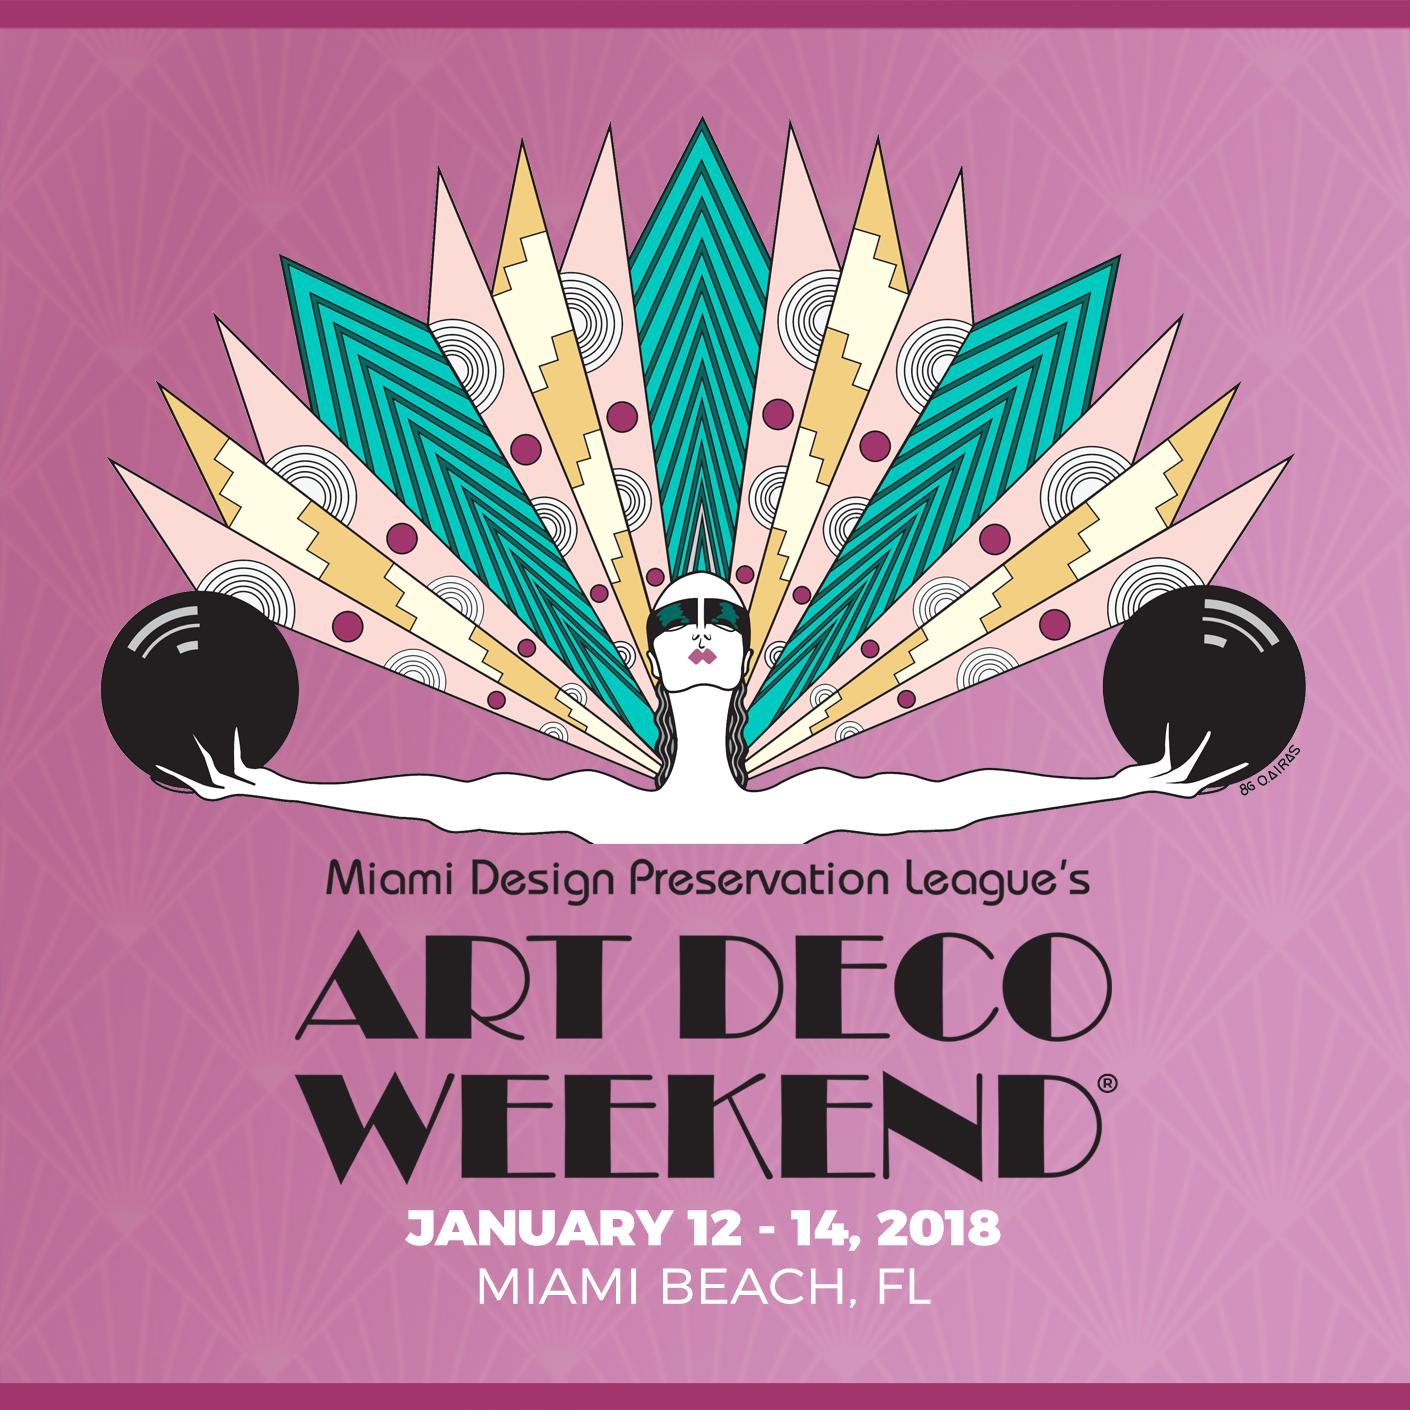 Cake Art Festival 2018 : Art Deco Weekend 2018 Share Media Agency Miami